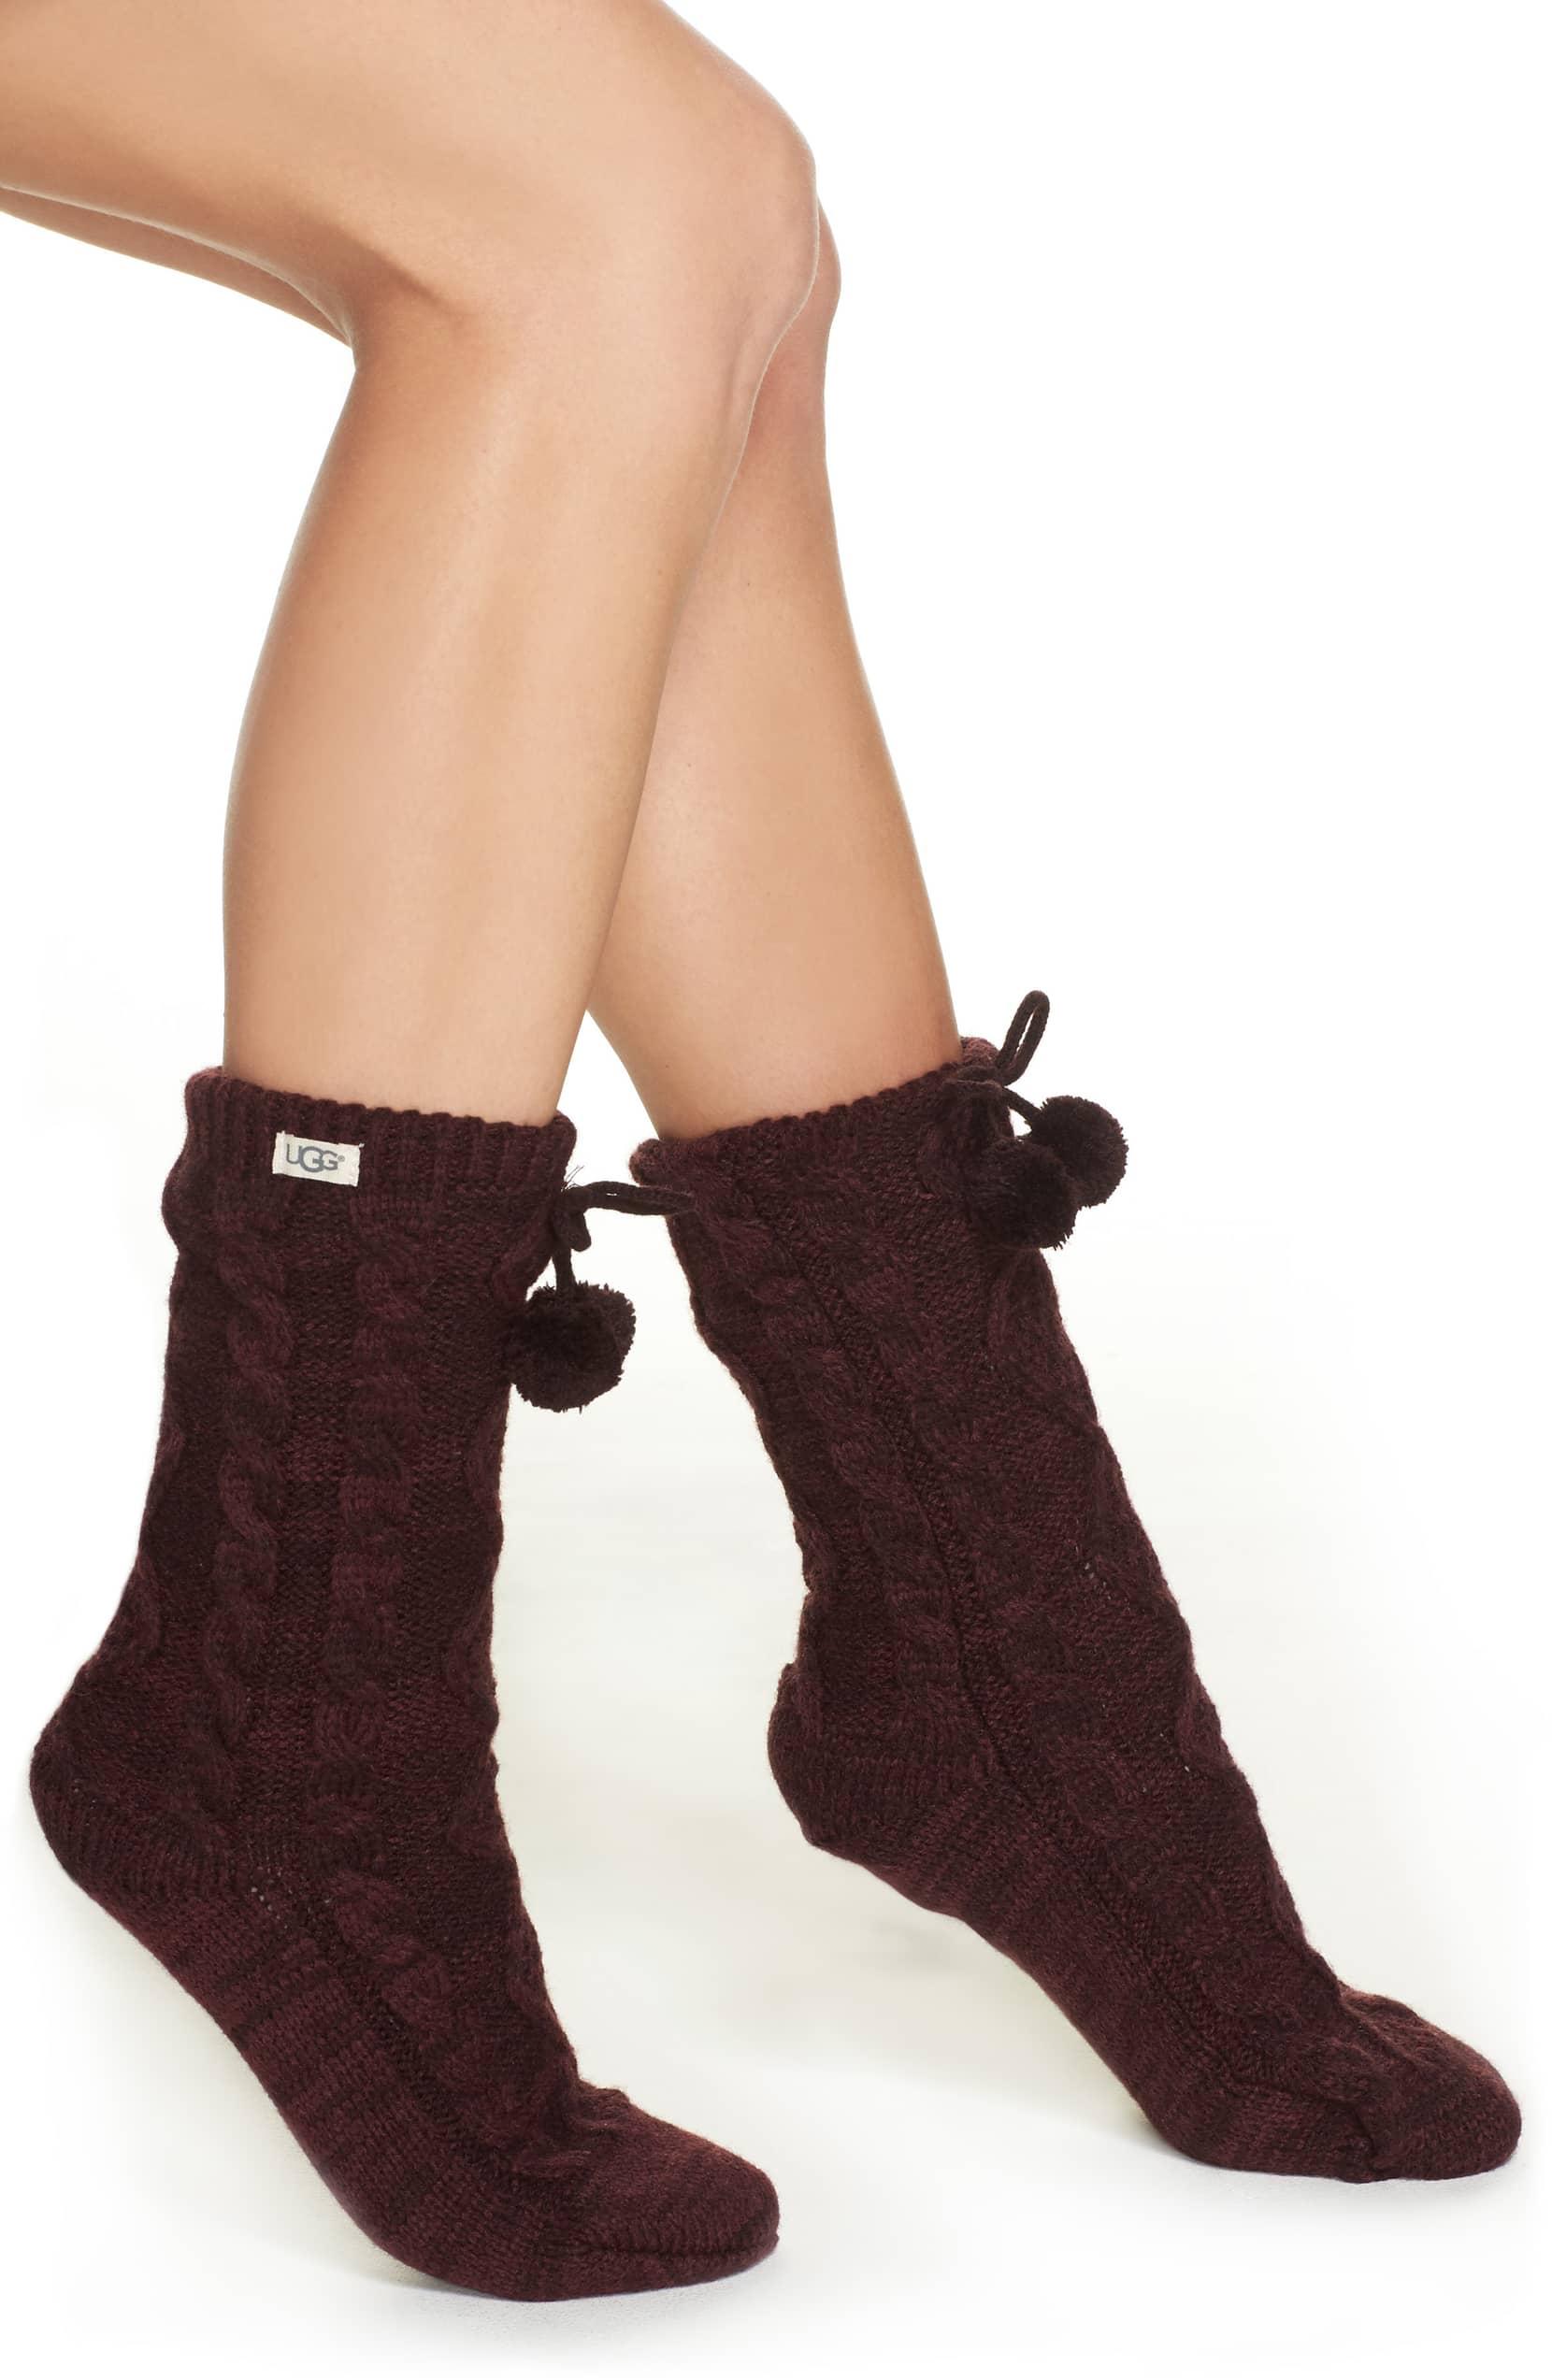 UGG fuzzy socks